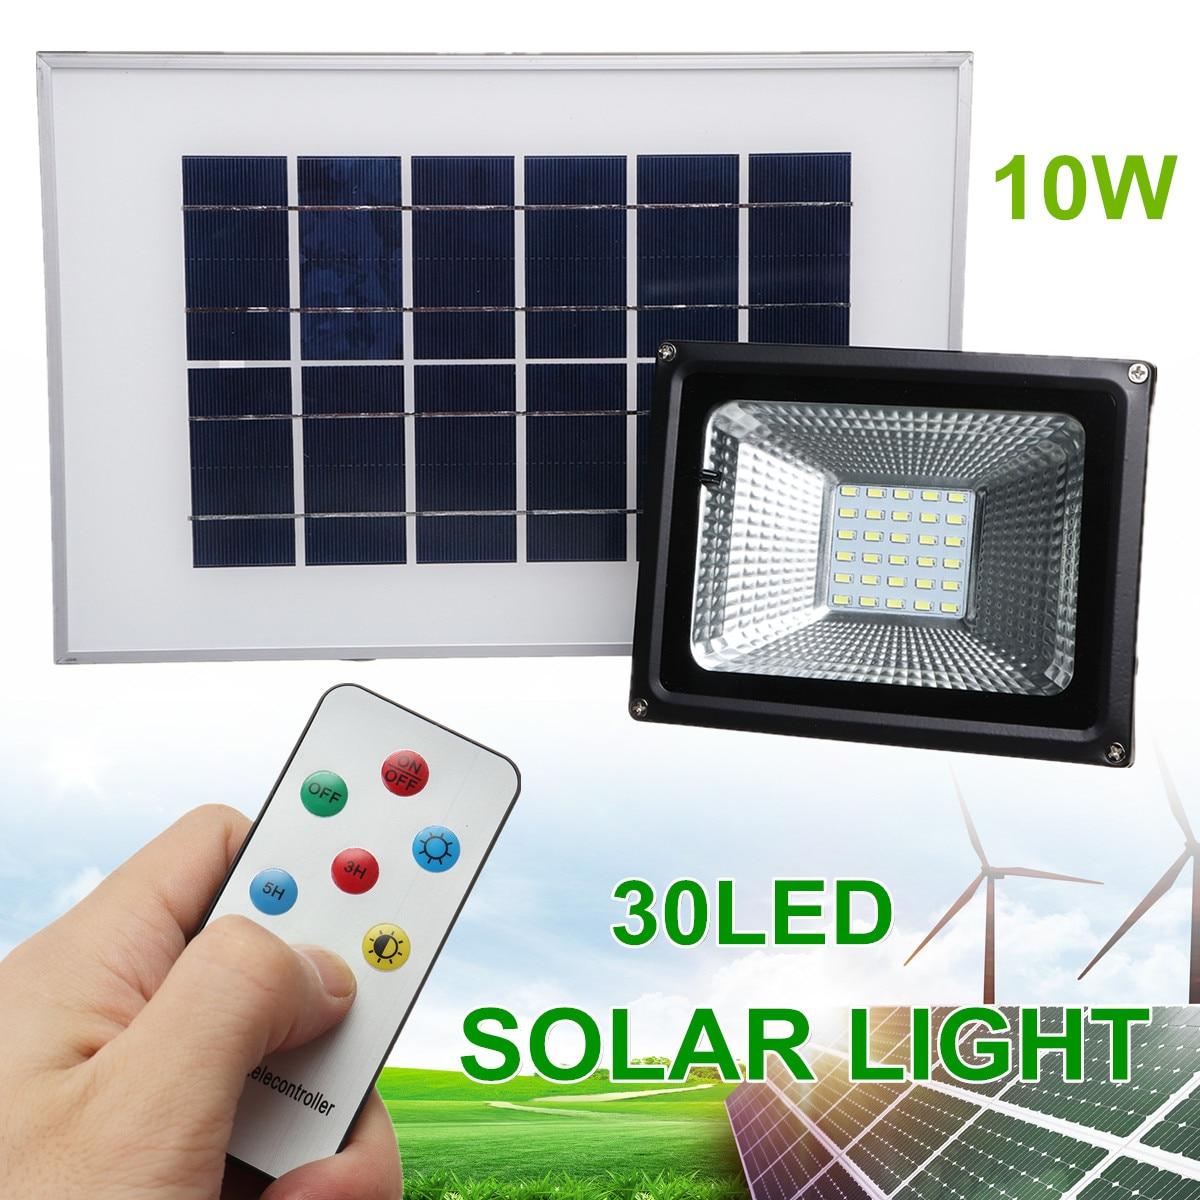 30 LED Solar Power Remote Control Outdoor Garden Lawn Lighting Lamp Flood Light Reusable & Super Bright Intelligent Sunlight цена 2017